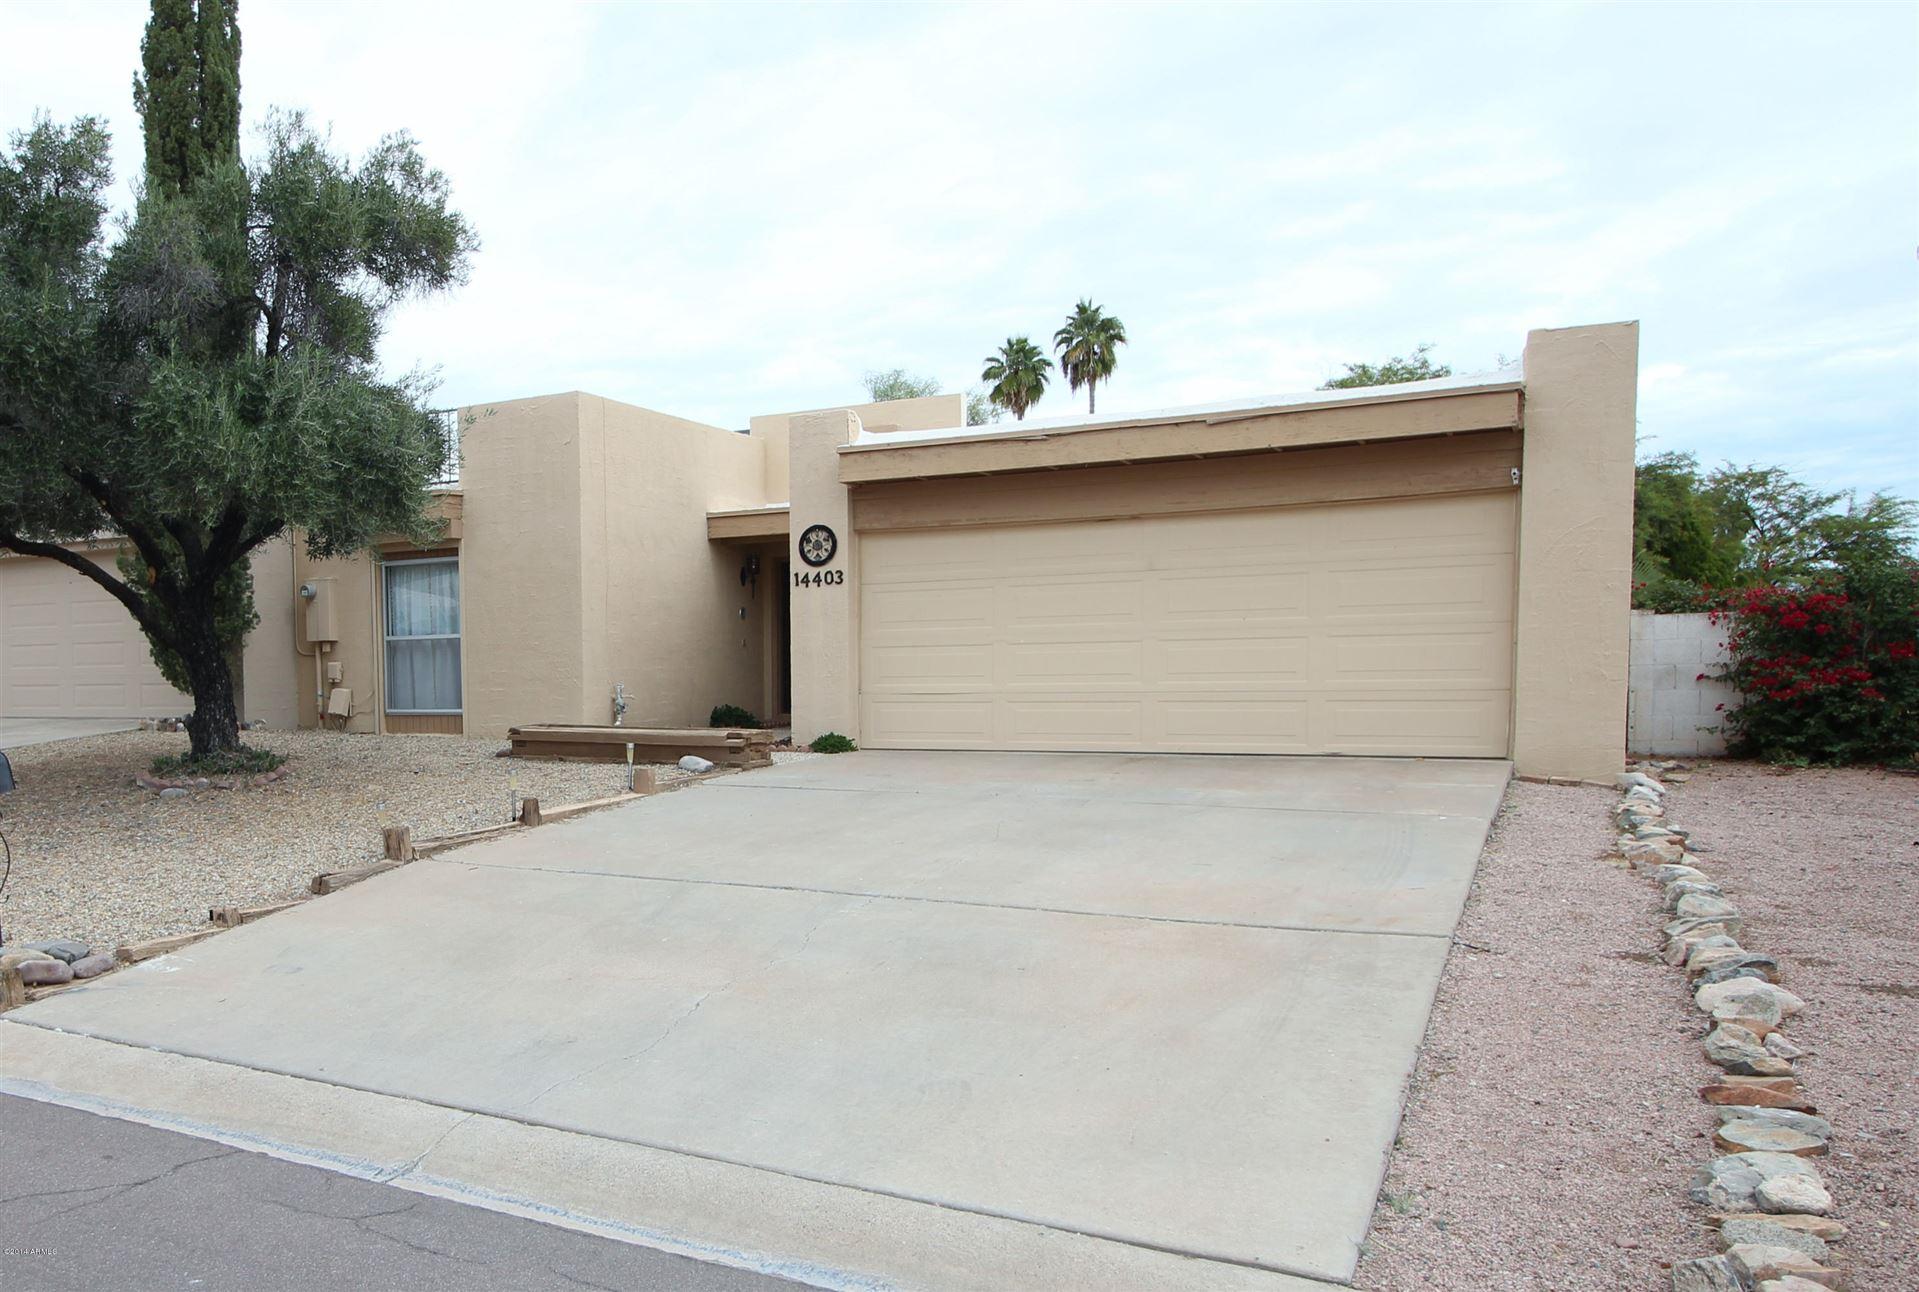 14403 N YERBA BUENA Way, Fountain Hills, AZ 85268 - MLS#: 6248603